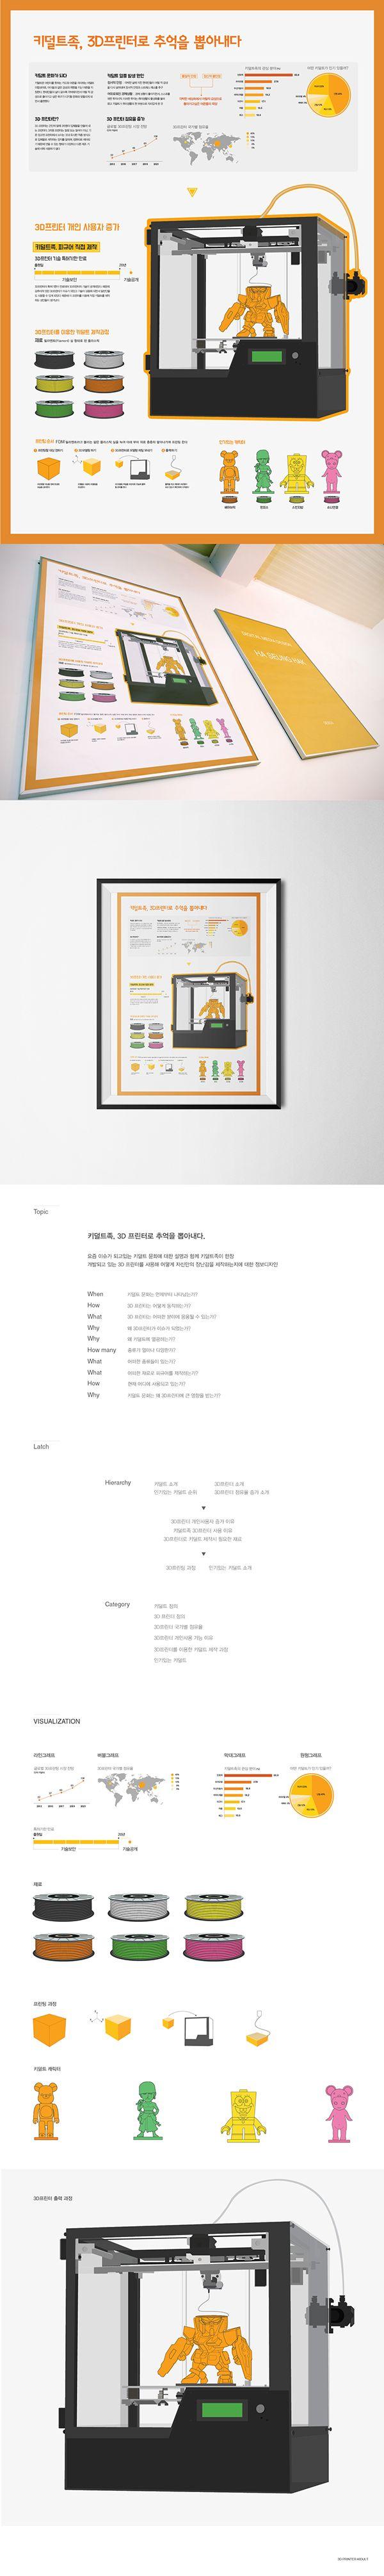 Ha Seunghak│ Information Design 2015│ Major in Digital Media Design │#hicoda │hicoda.hongik.ac.kr